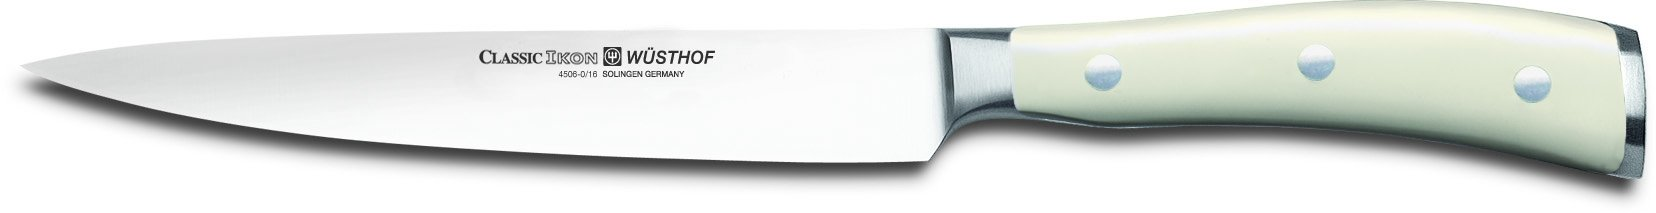 Wusthof Classic Ikon 16cms (6.3-Inch) Sandwich Knife, Creme